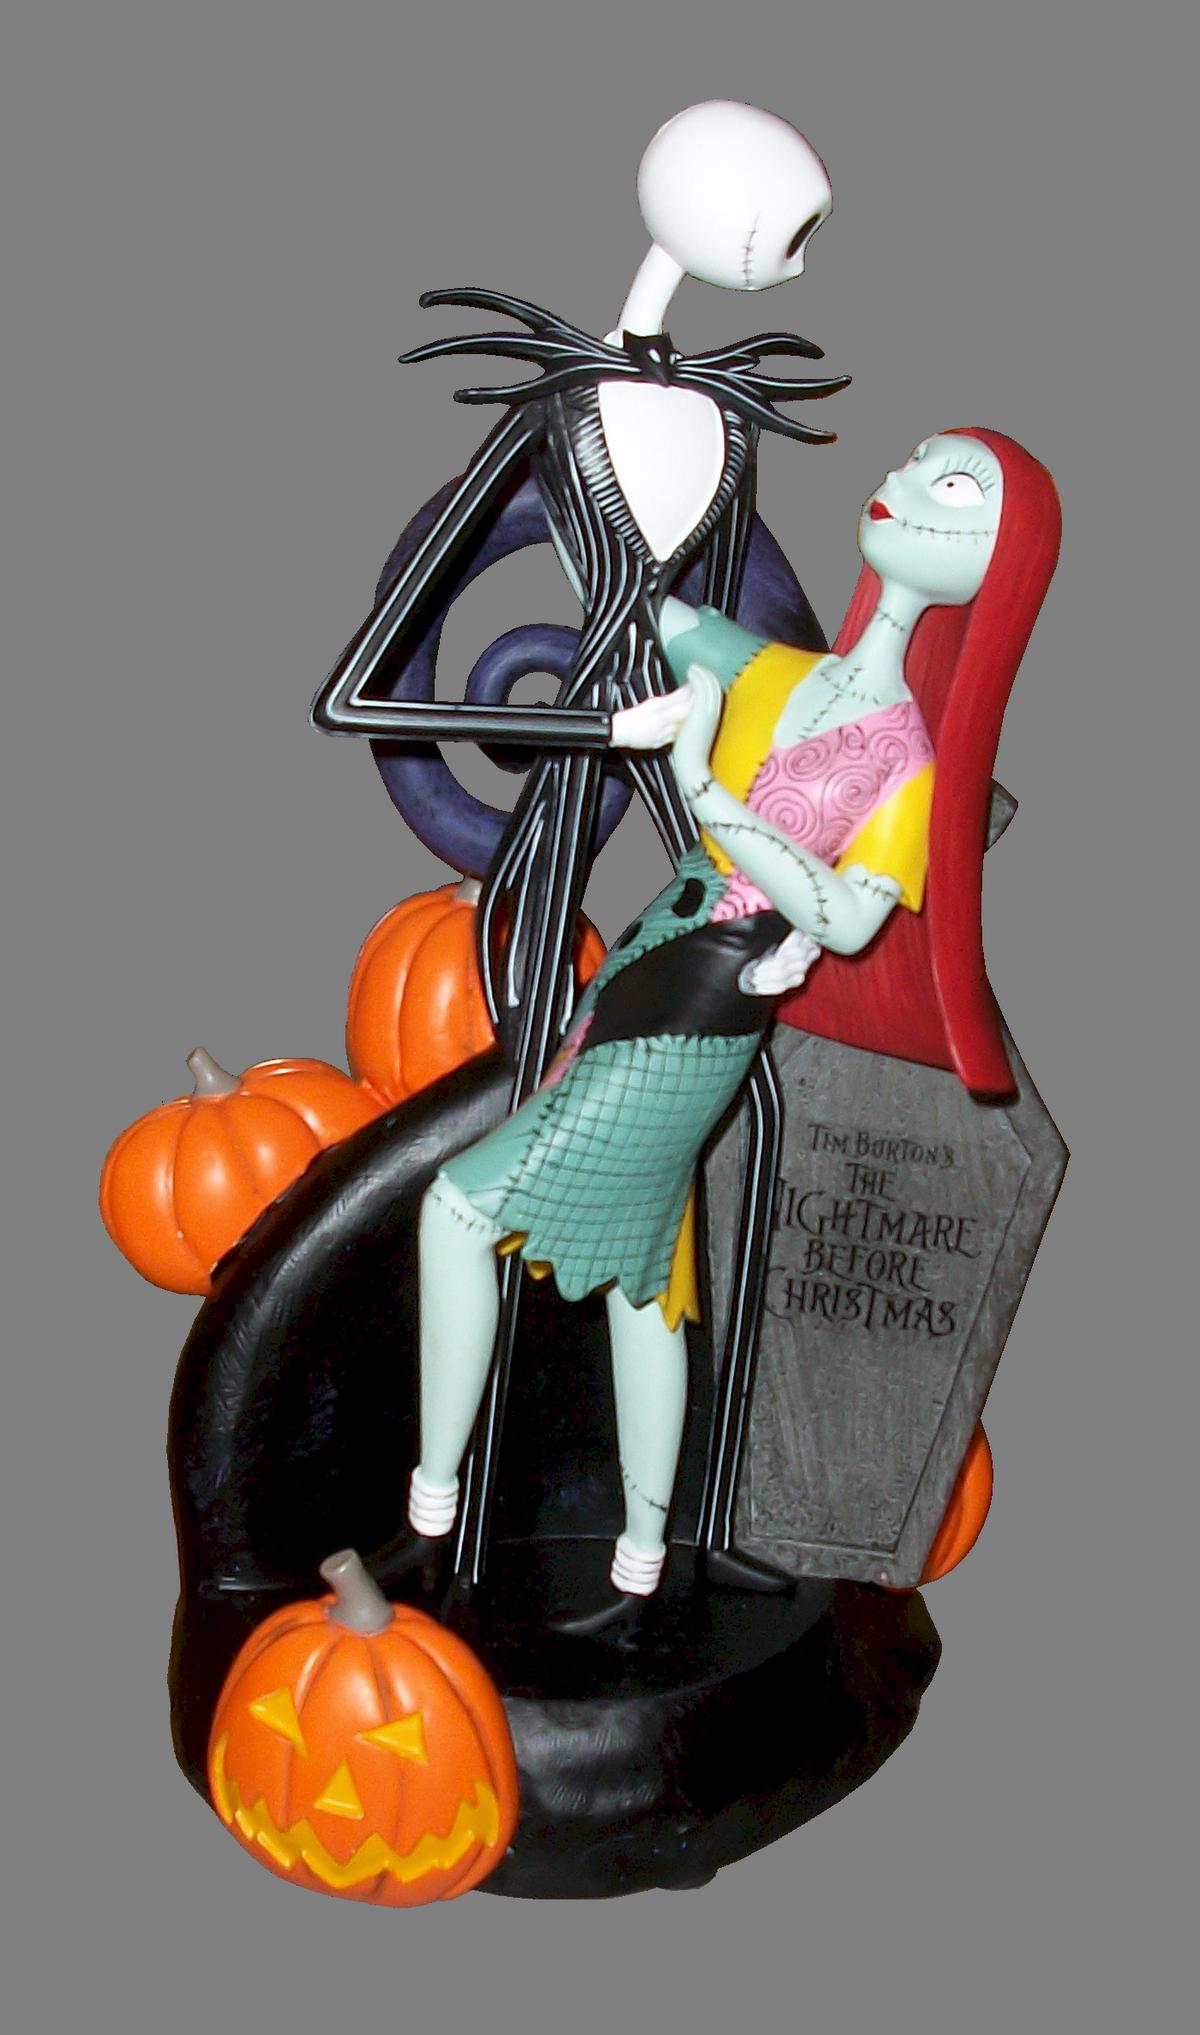 Disney The Nightmare Before Christmas ~ Jack and Sally Medium Big Figurine by Keri Murphy © Dizdude.com